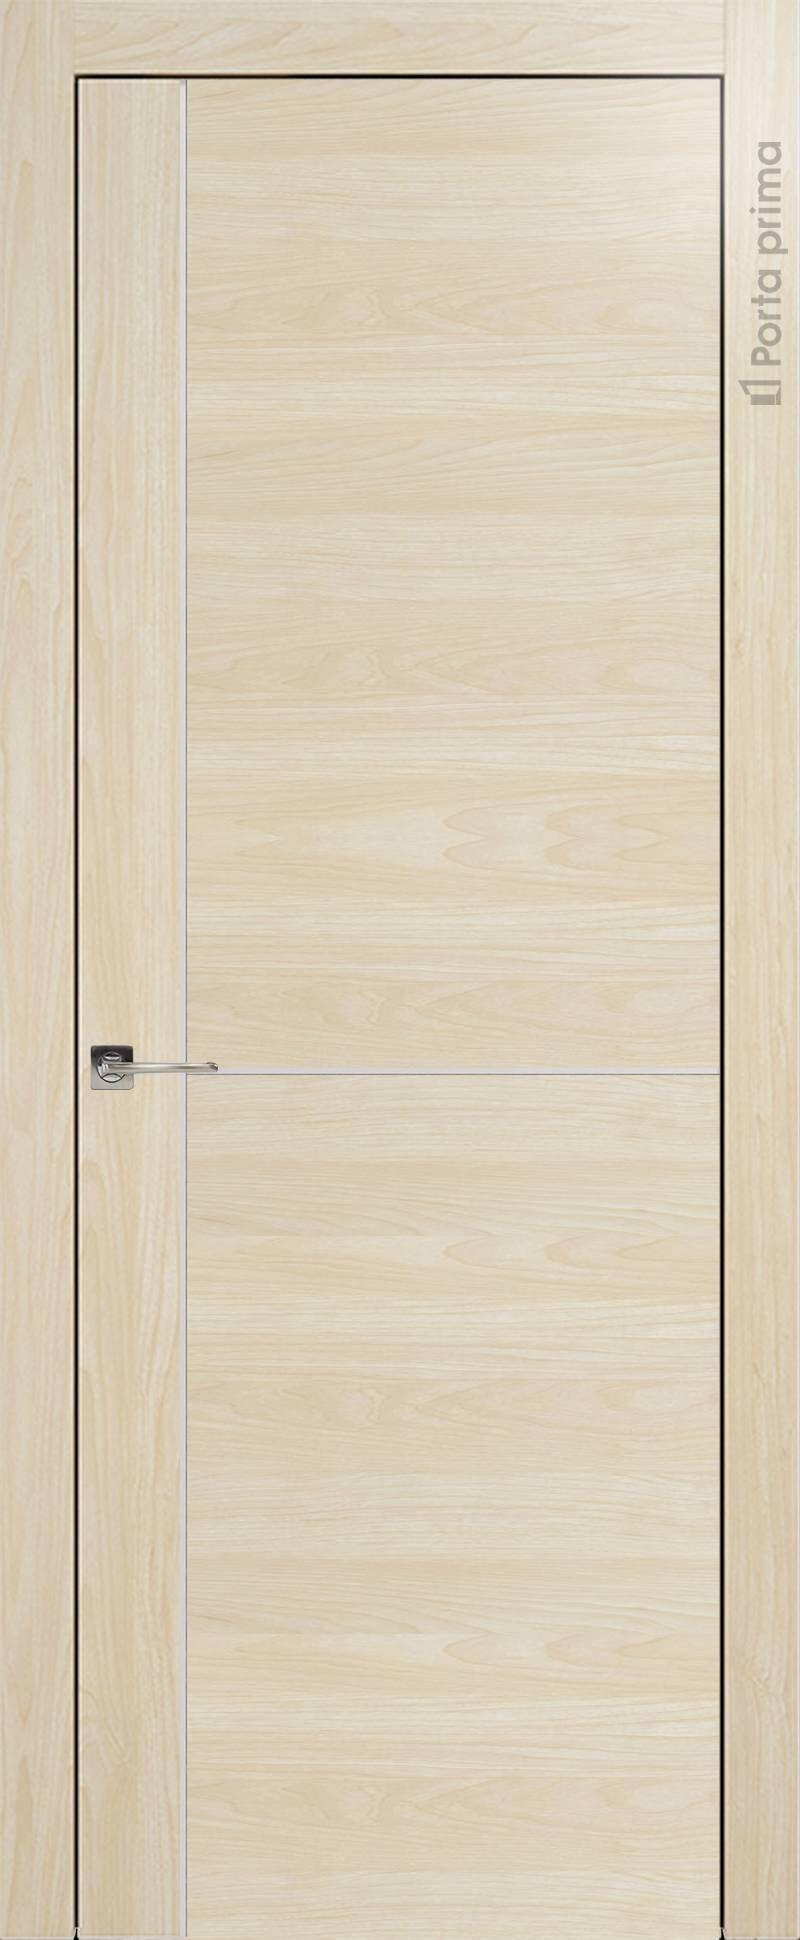 Tivoli Е-3 цвет - Клен Без стекла (ДГ)